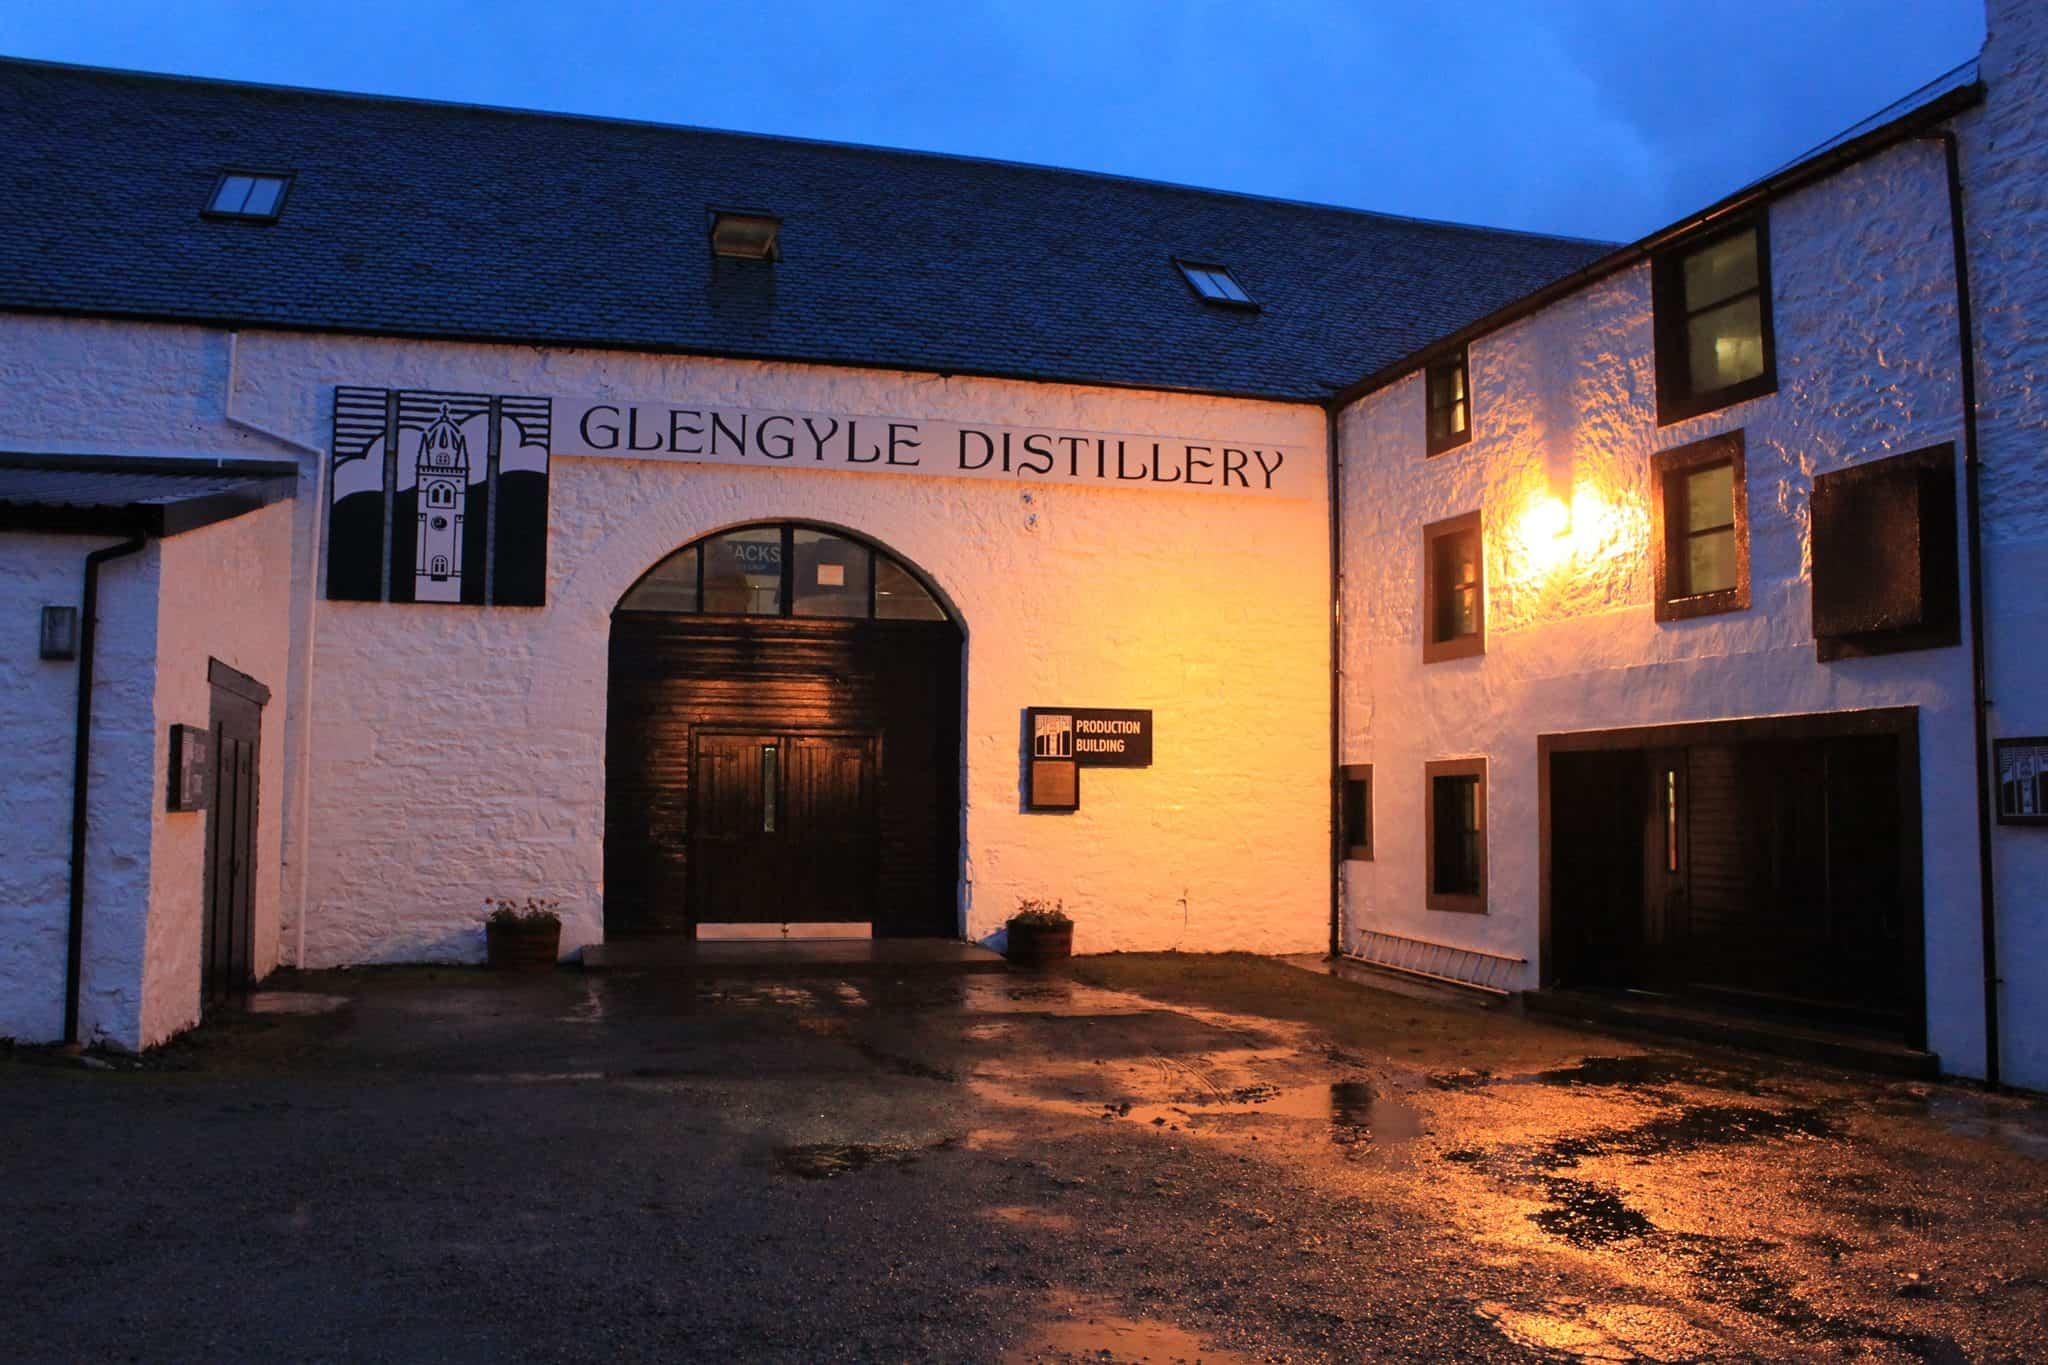 Glengyle Distillery